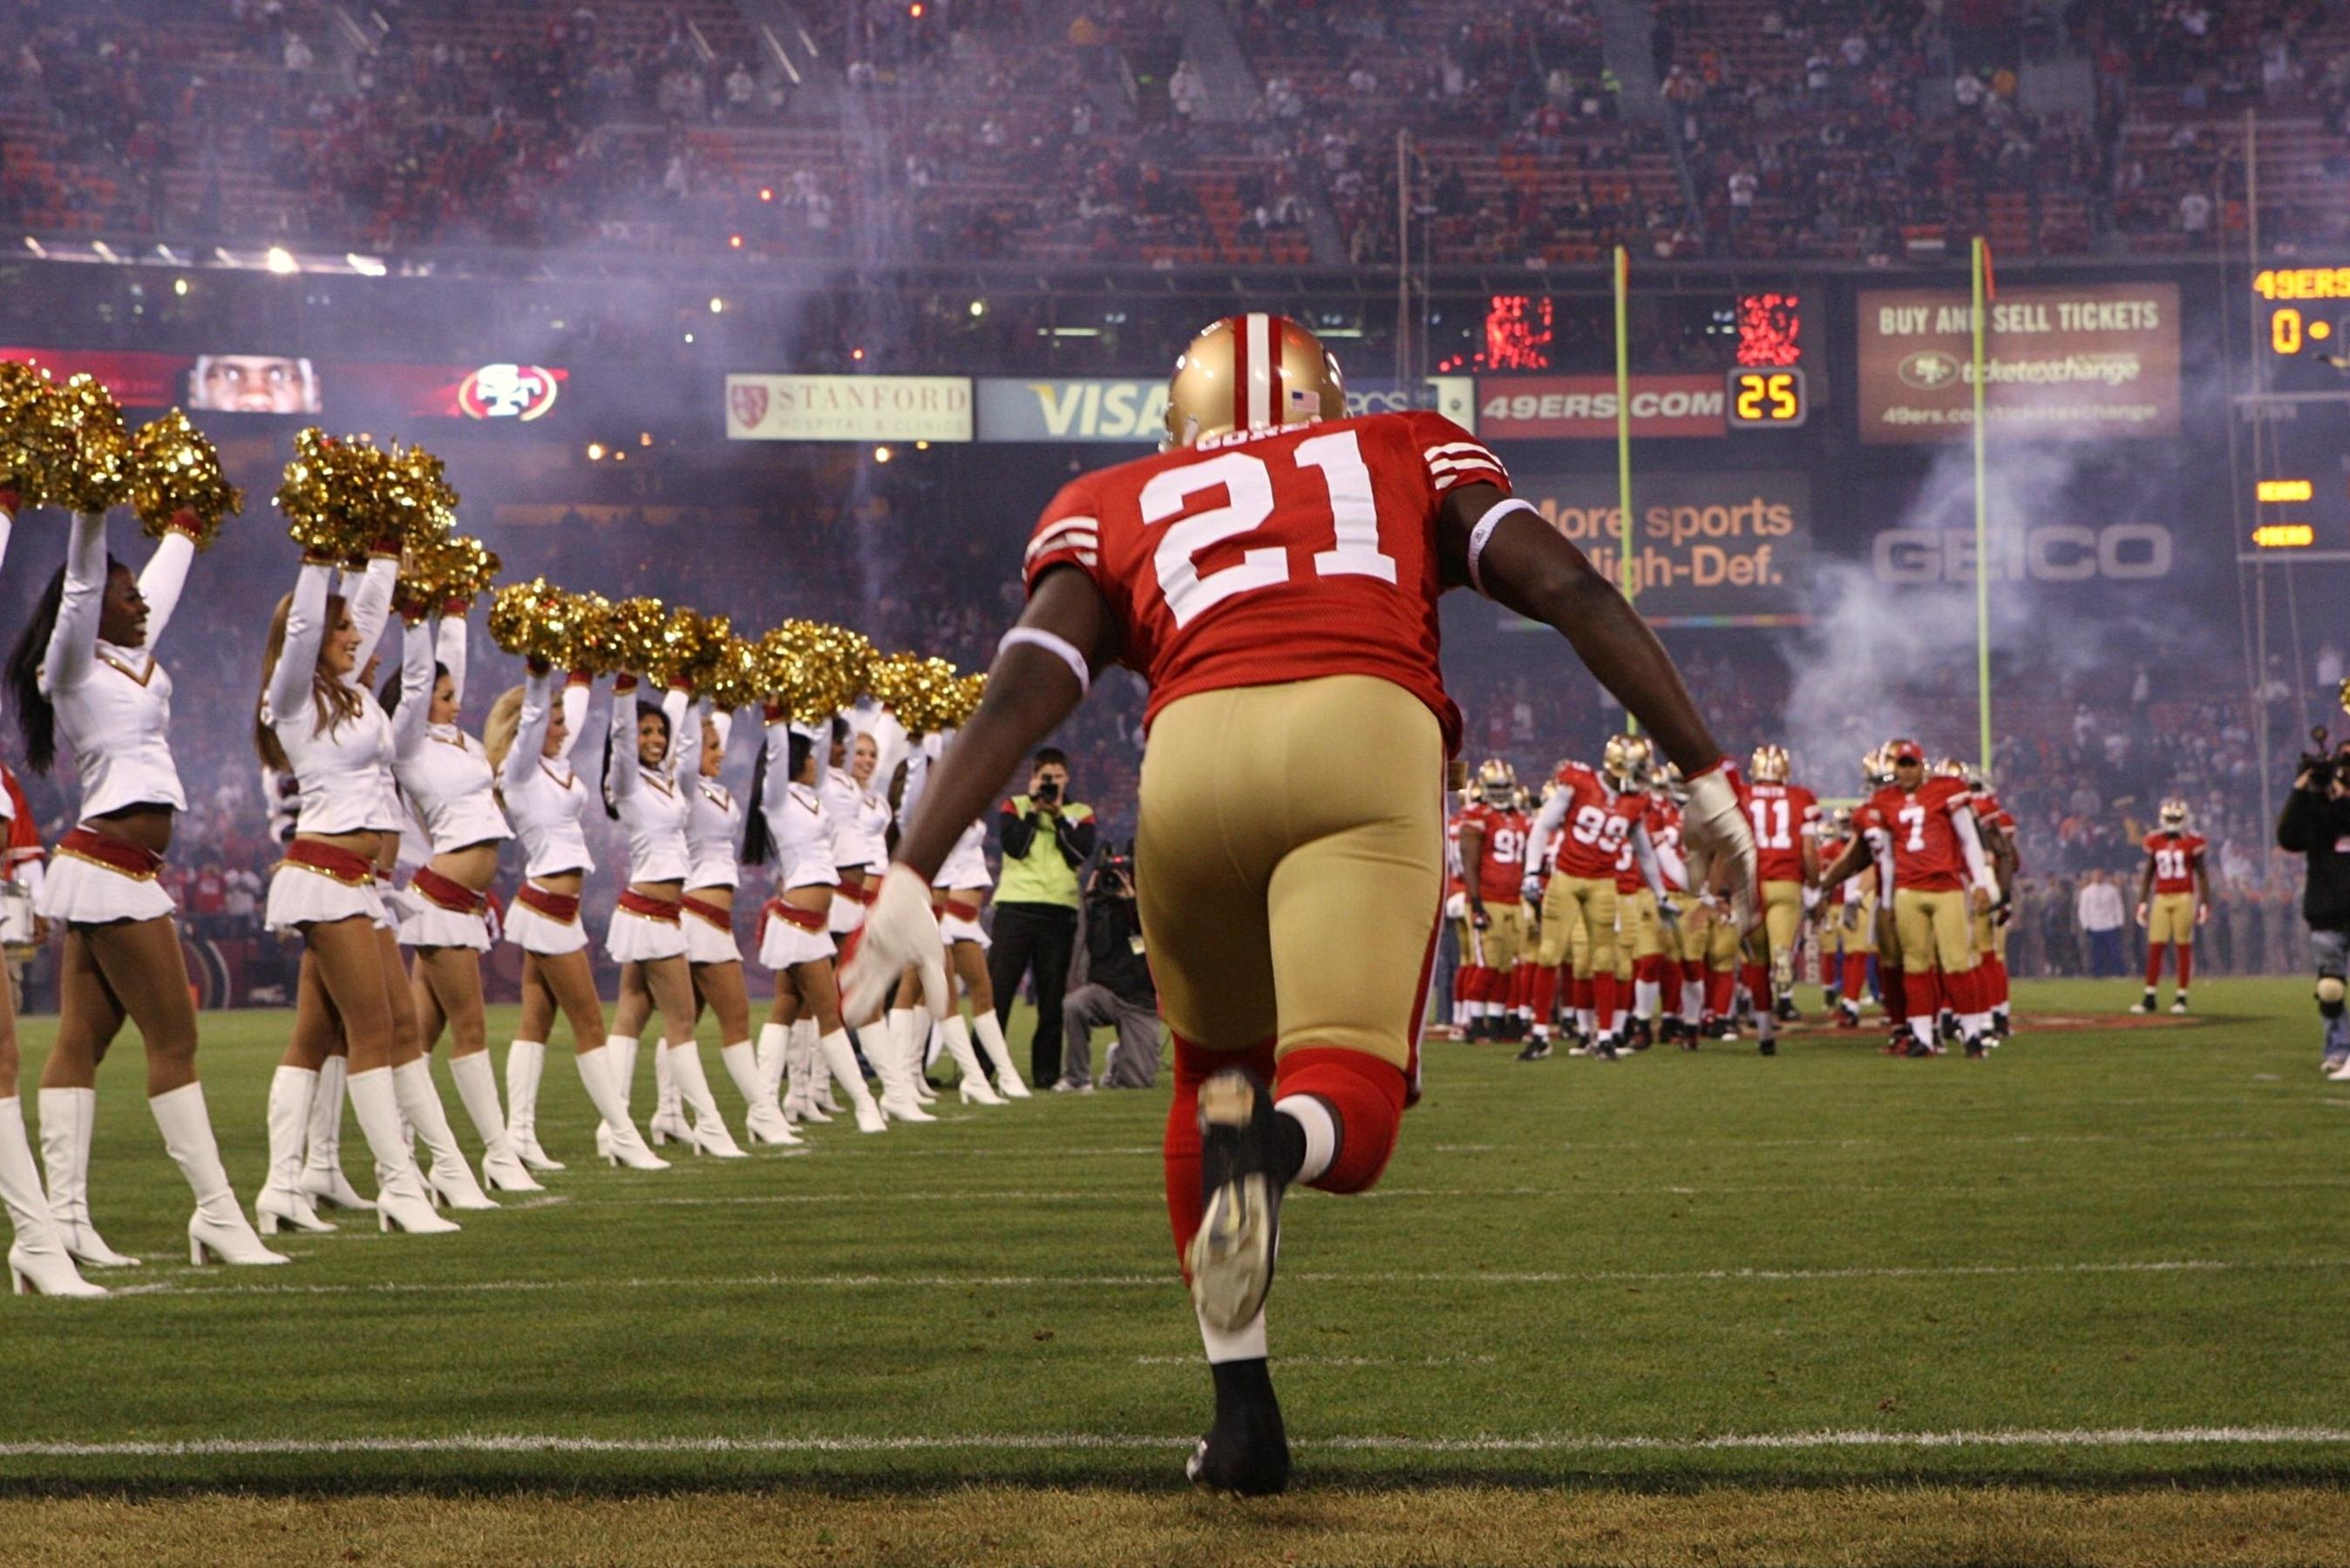 49ers vs bears betting predictions